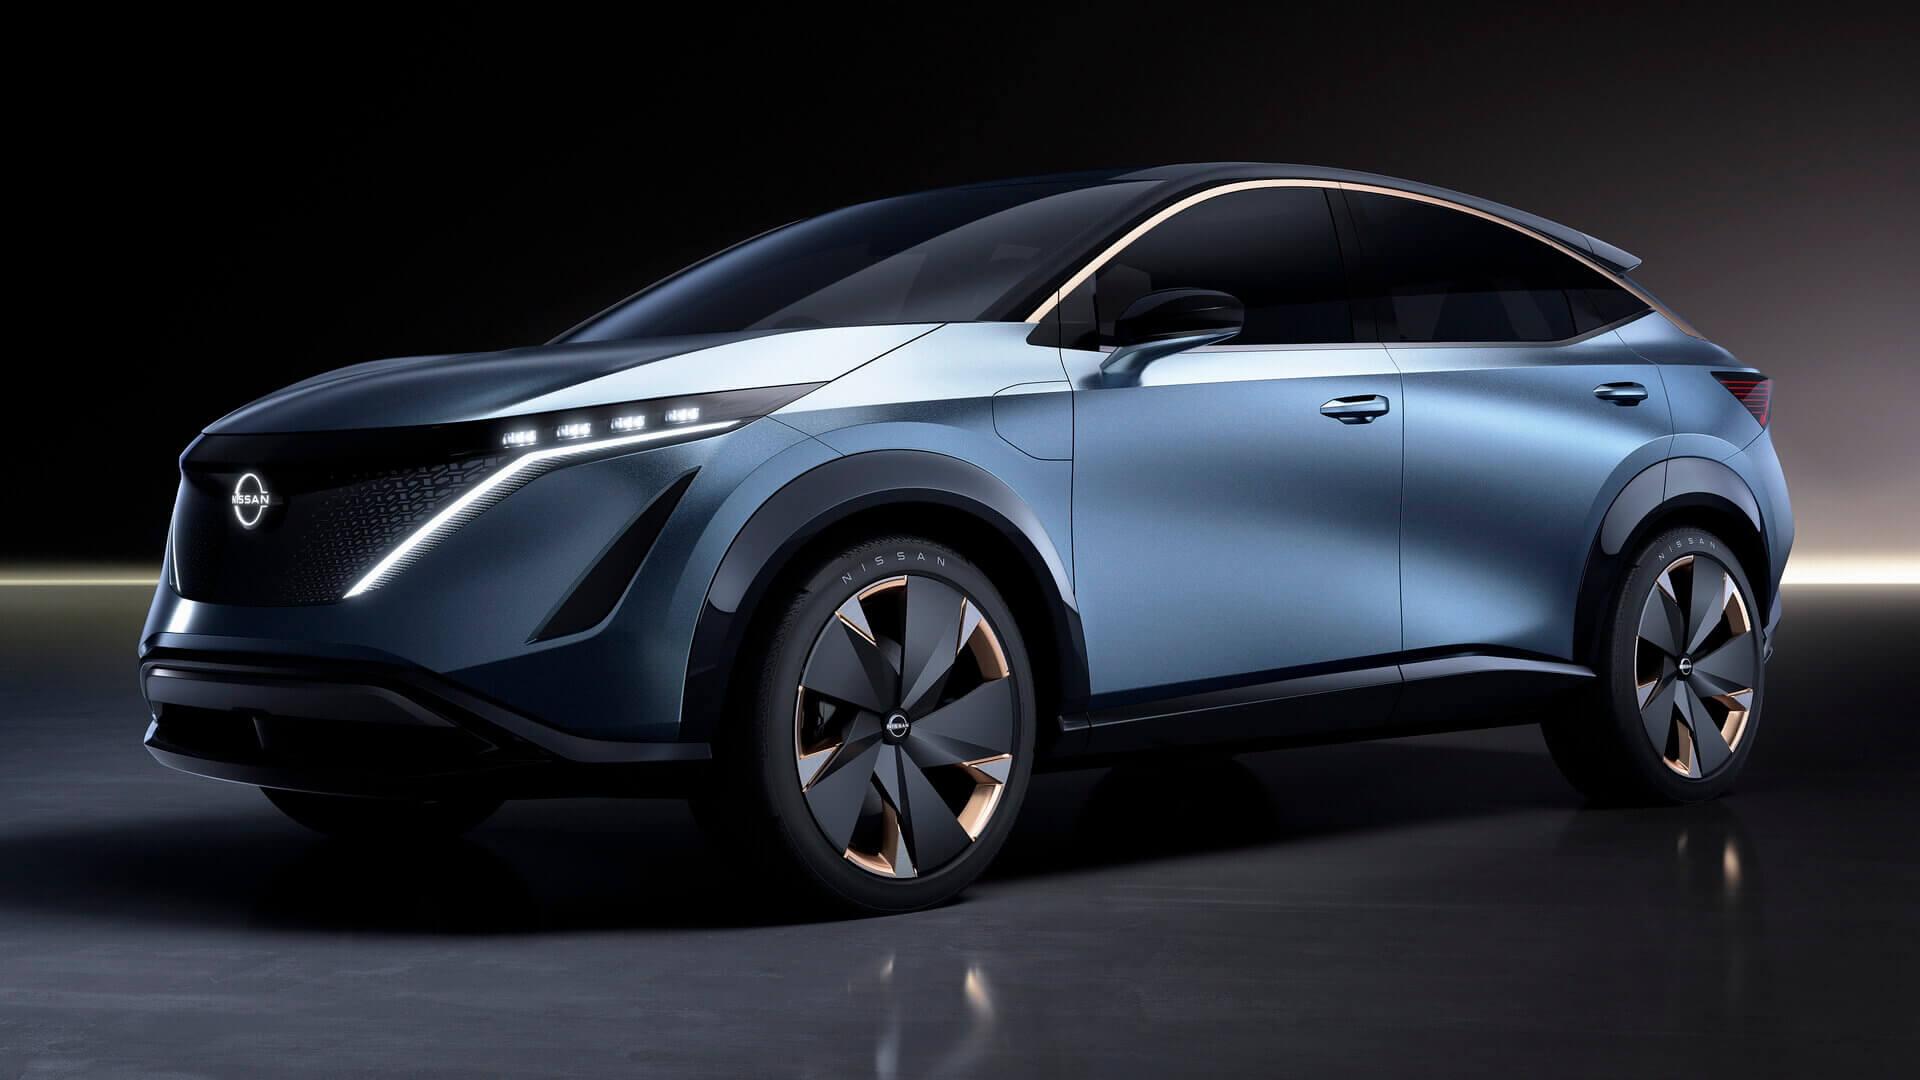 Концепт электрического кроссовера Nissan Ariya